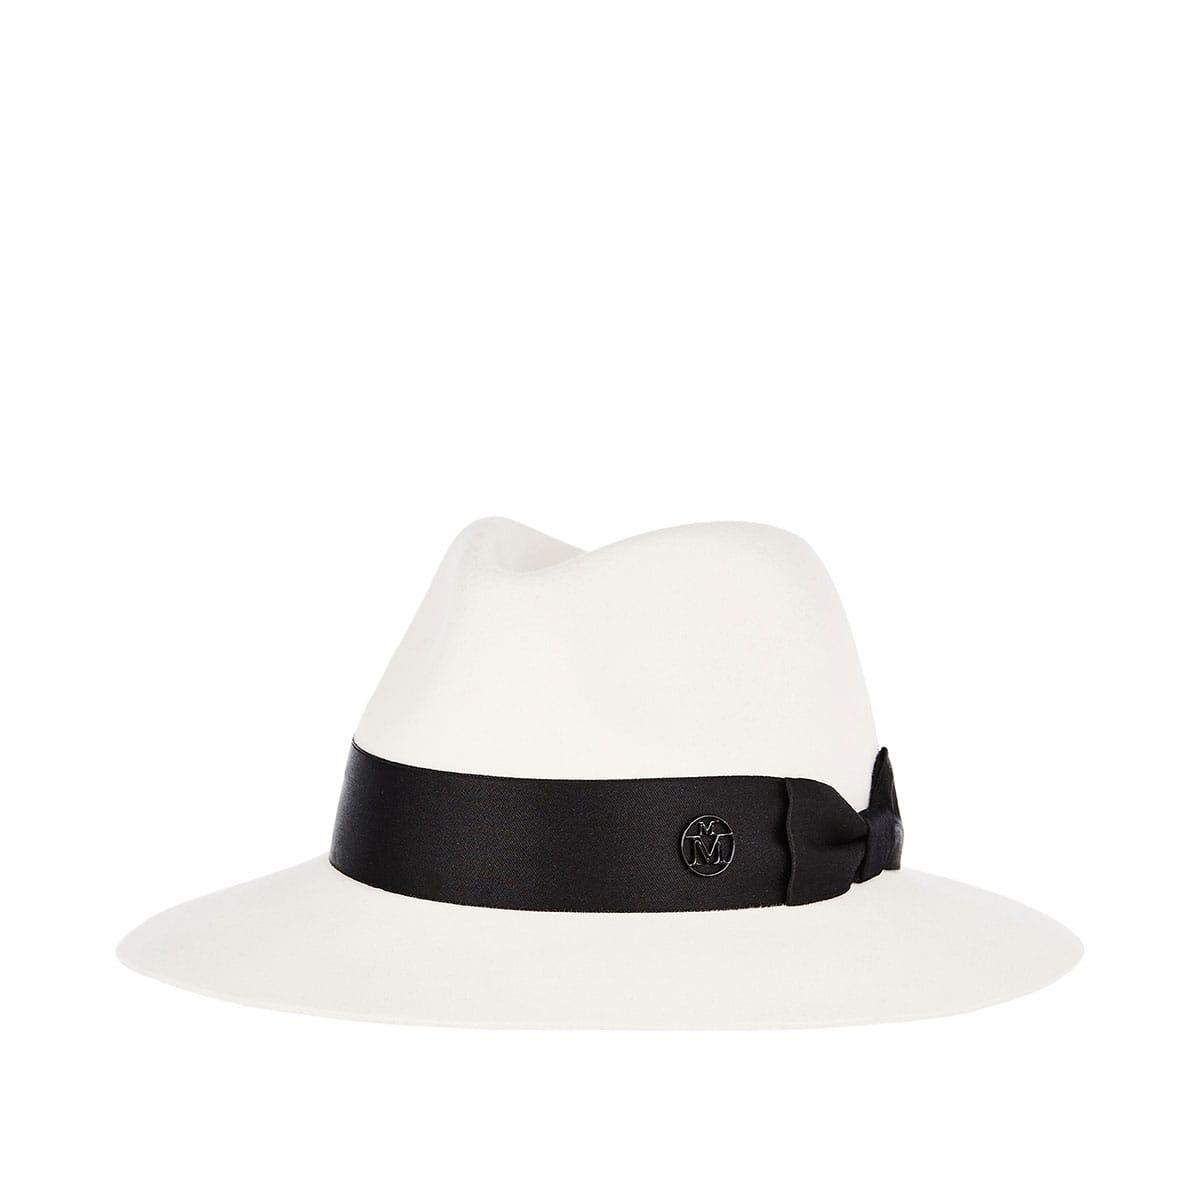 Rico furfelt fedora hat